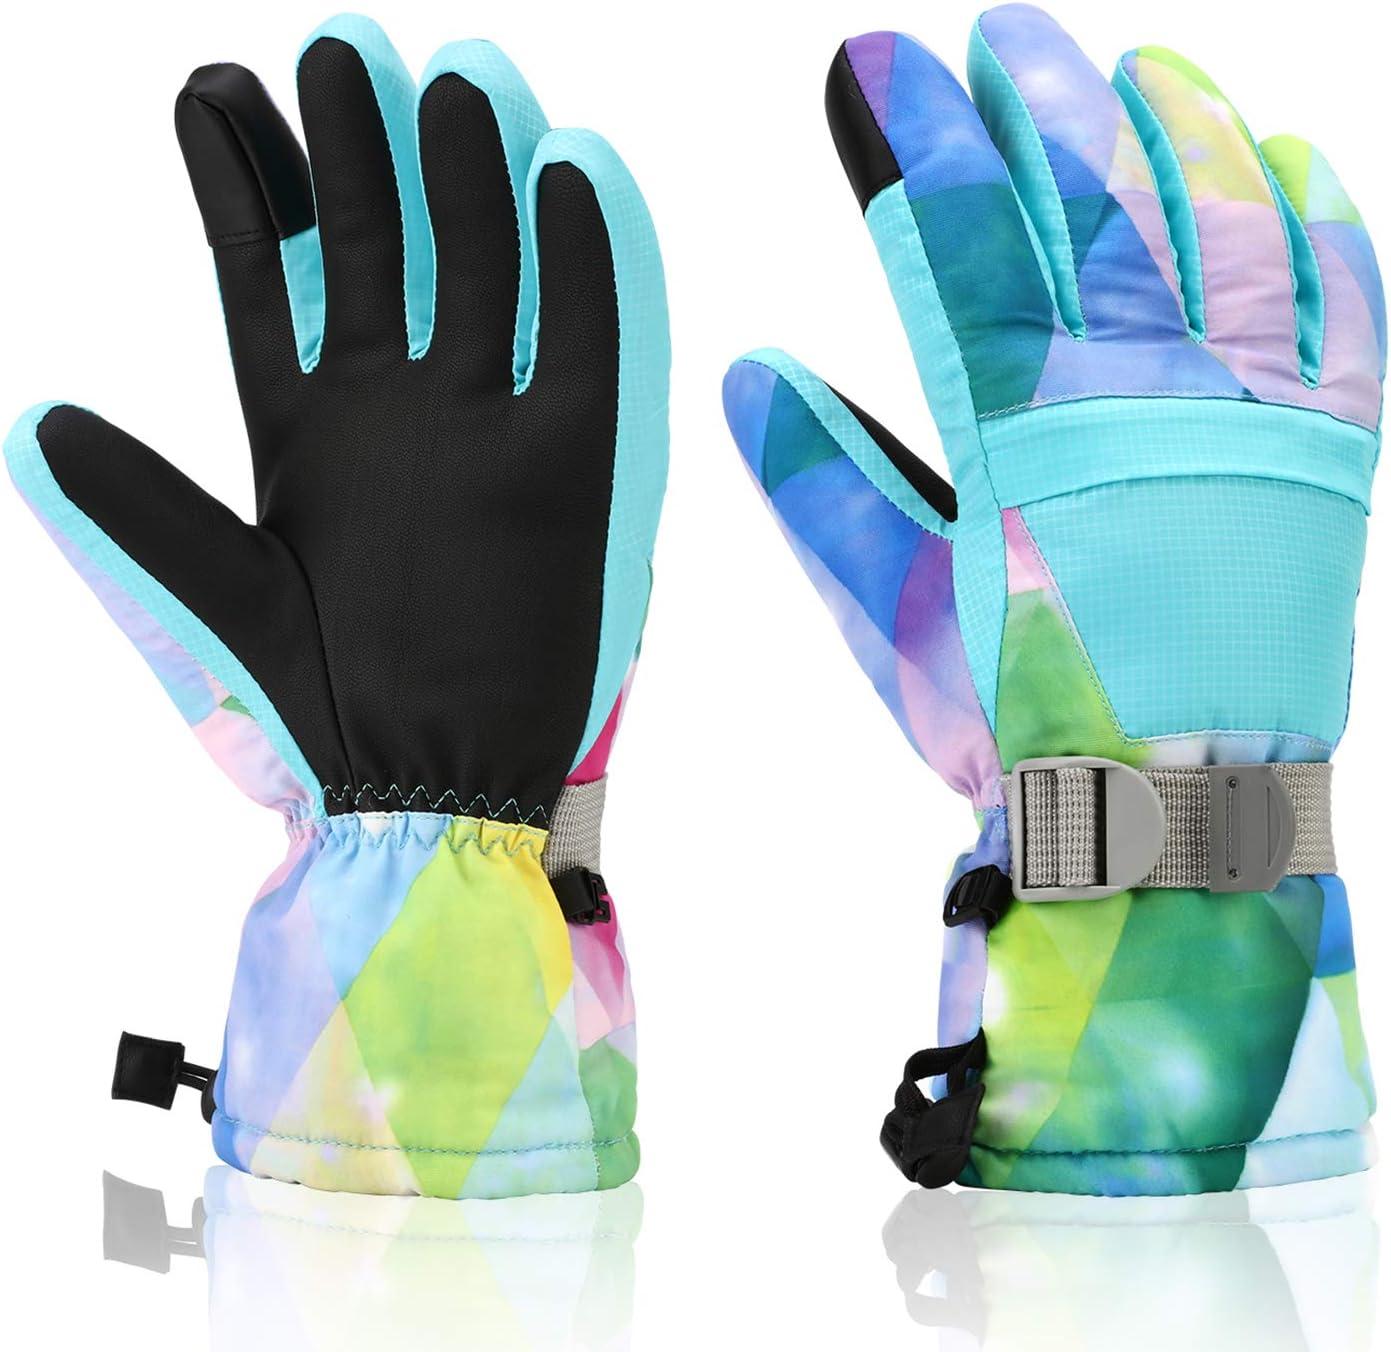 Ami/&Li tots Snow Ski Winter Mittens Gloves Waterproof for Baby Children Boys Girls Fleece Lining with Safety Buckle